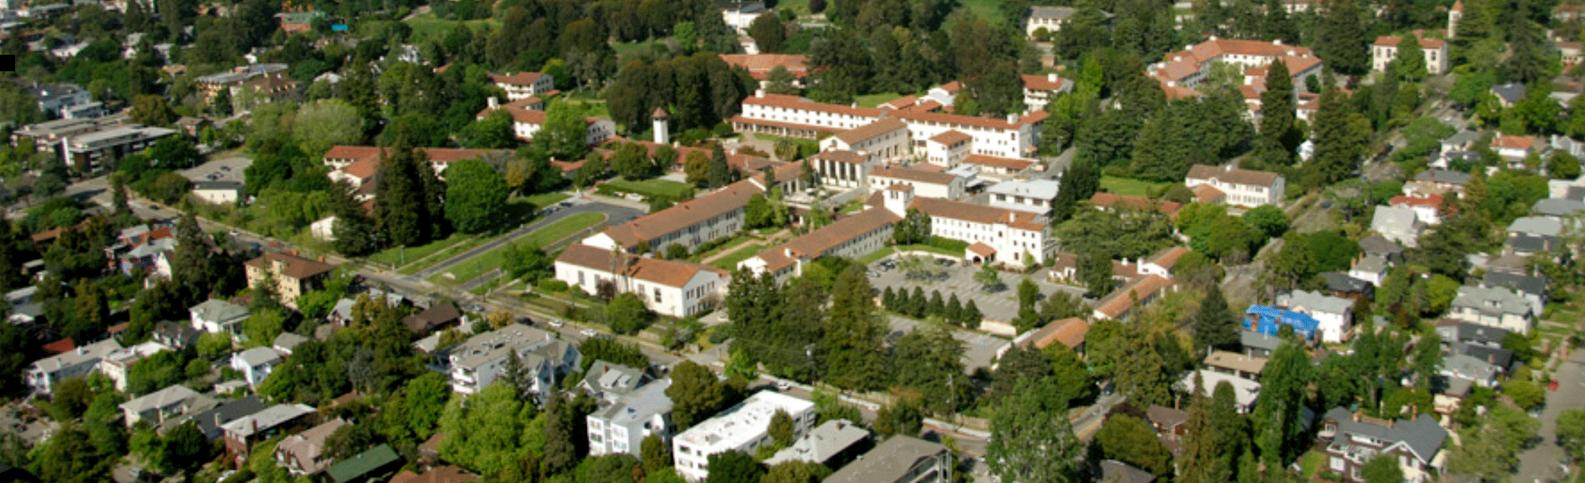 aerial view of clark kerr campus, UC Berkeley